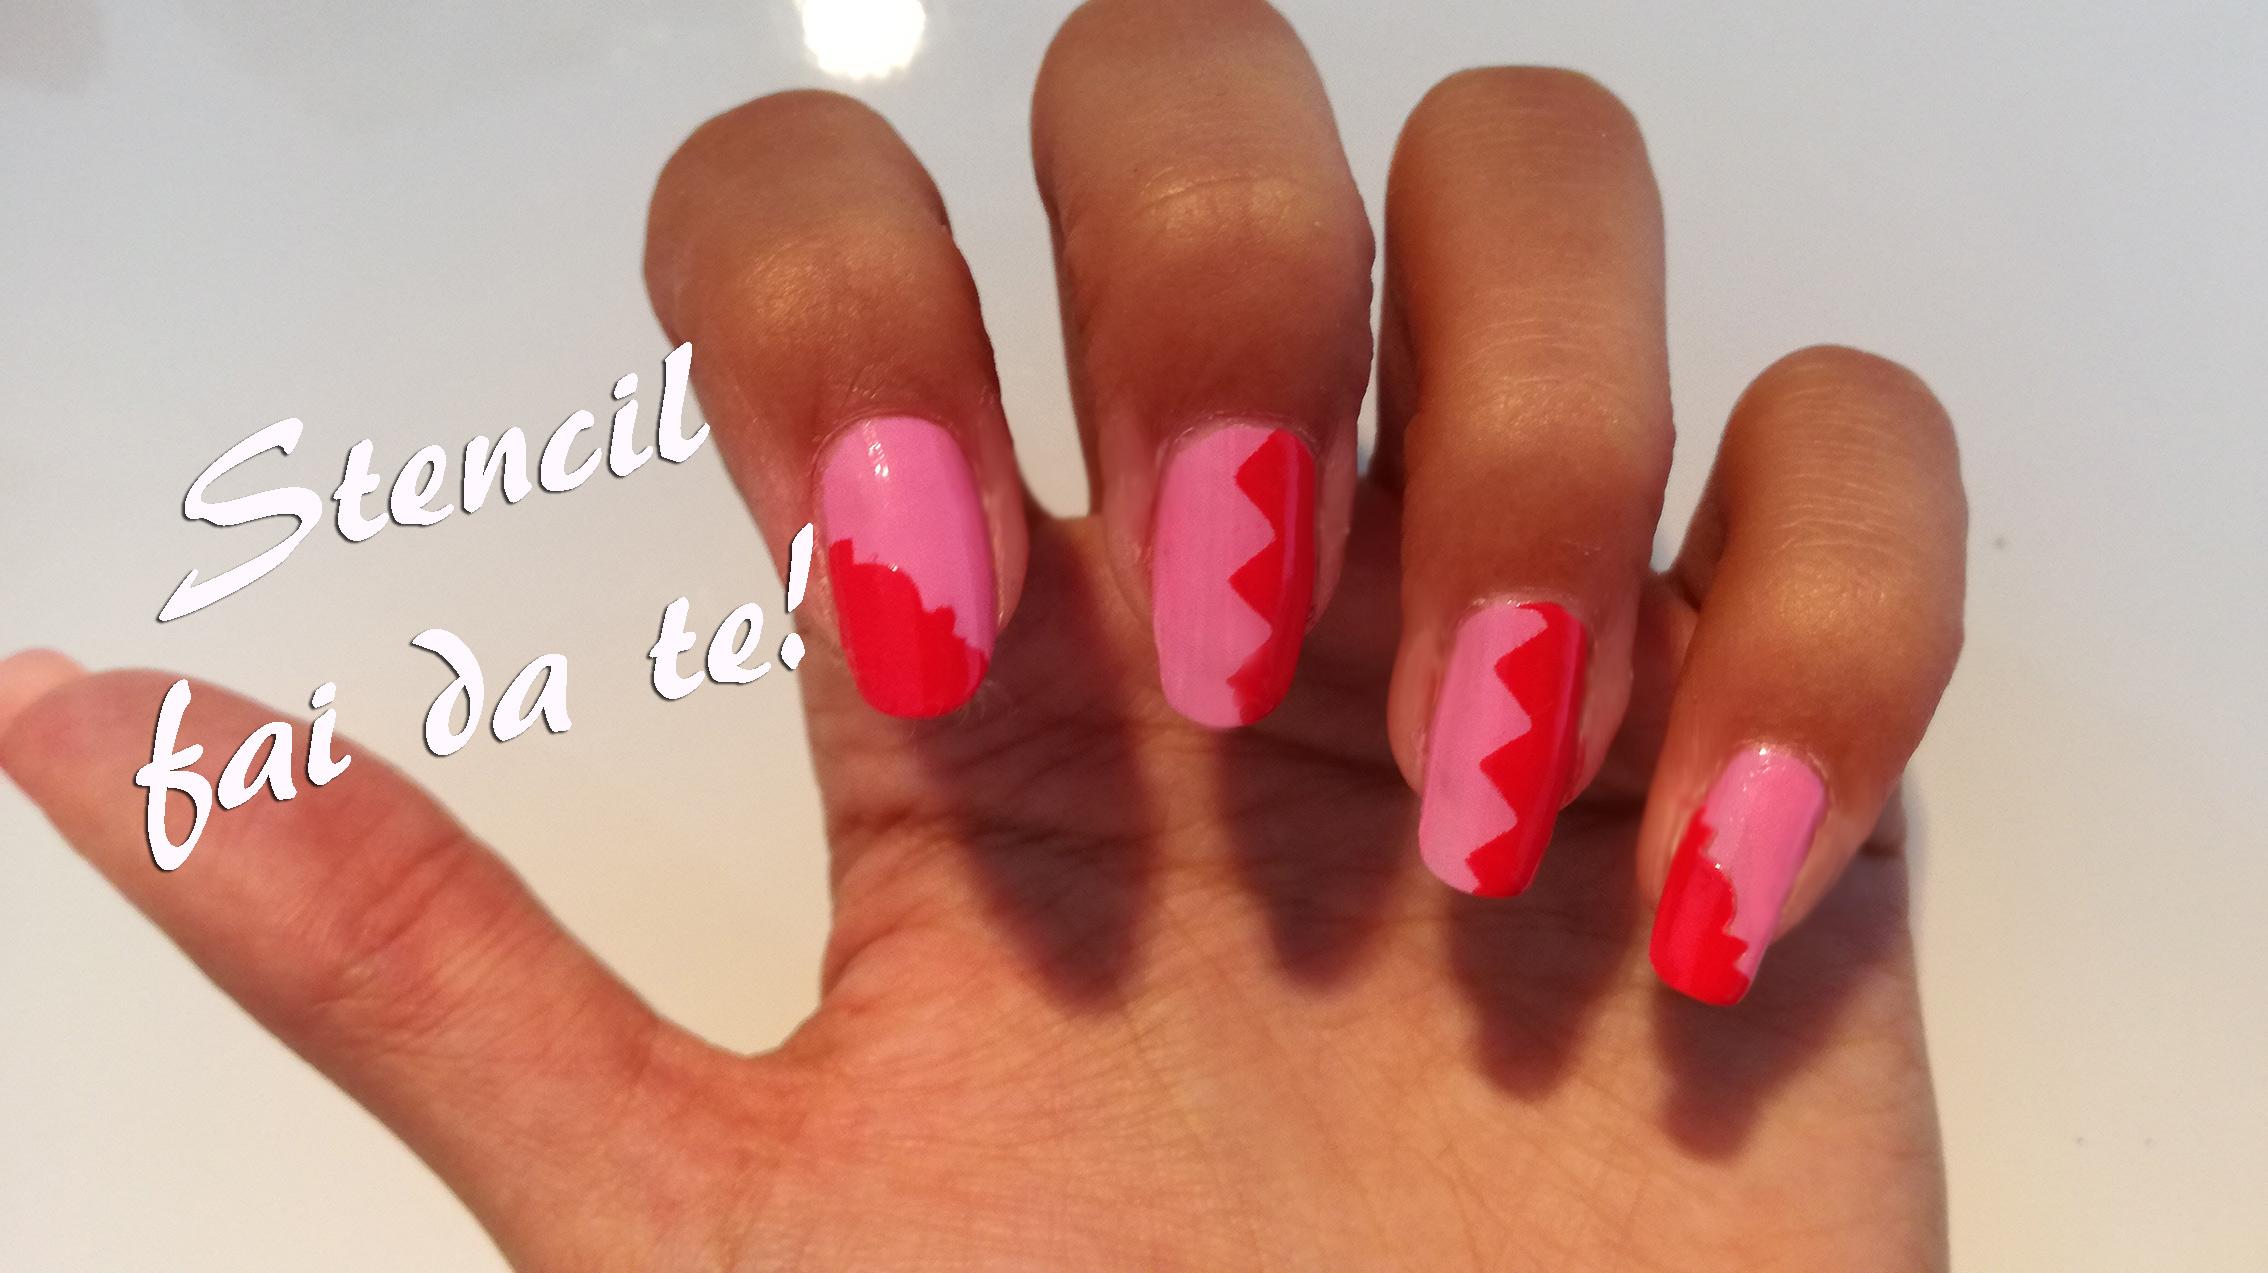 2016 11 07 stencil fai da te per nailart karotina nails